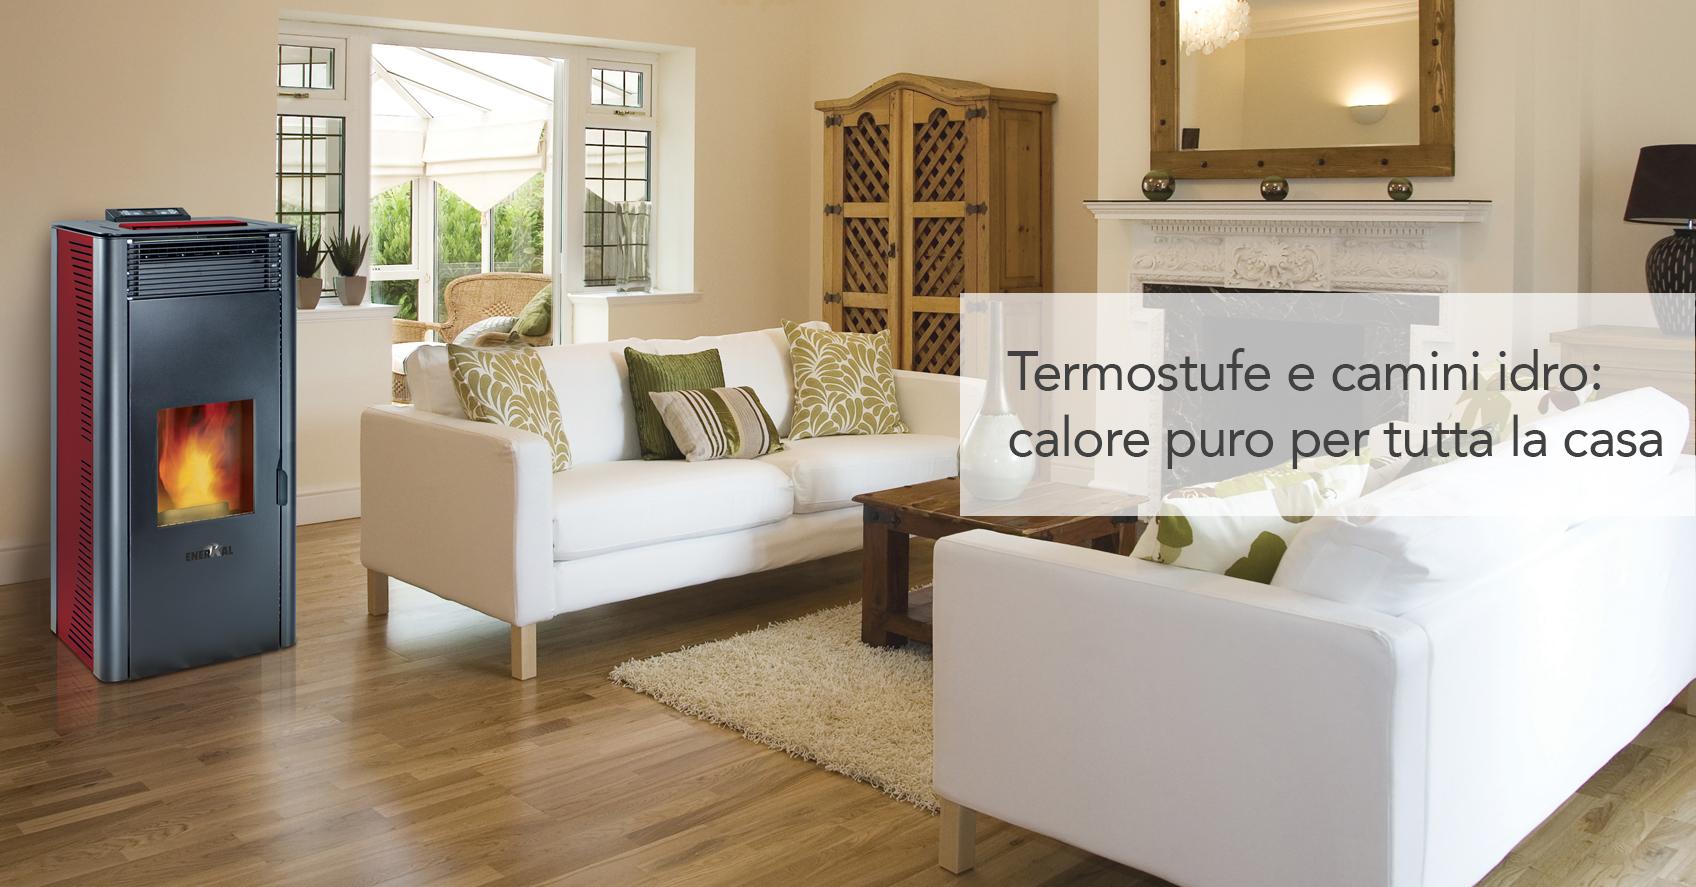 Topimage-termostufe-idro